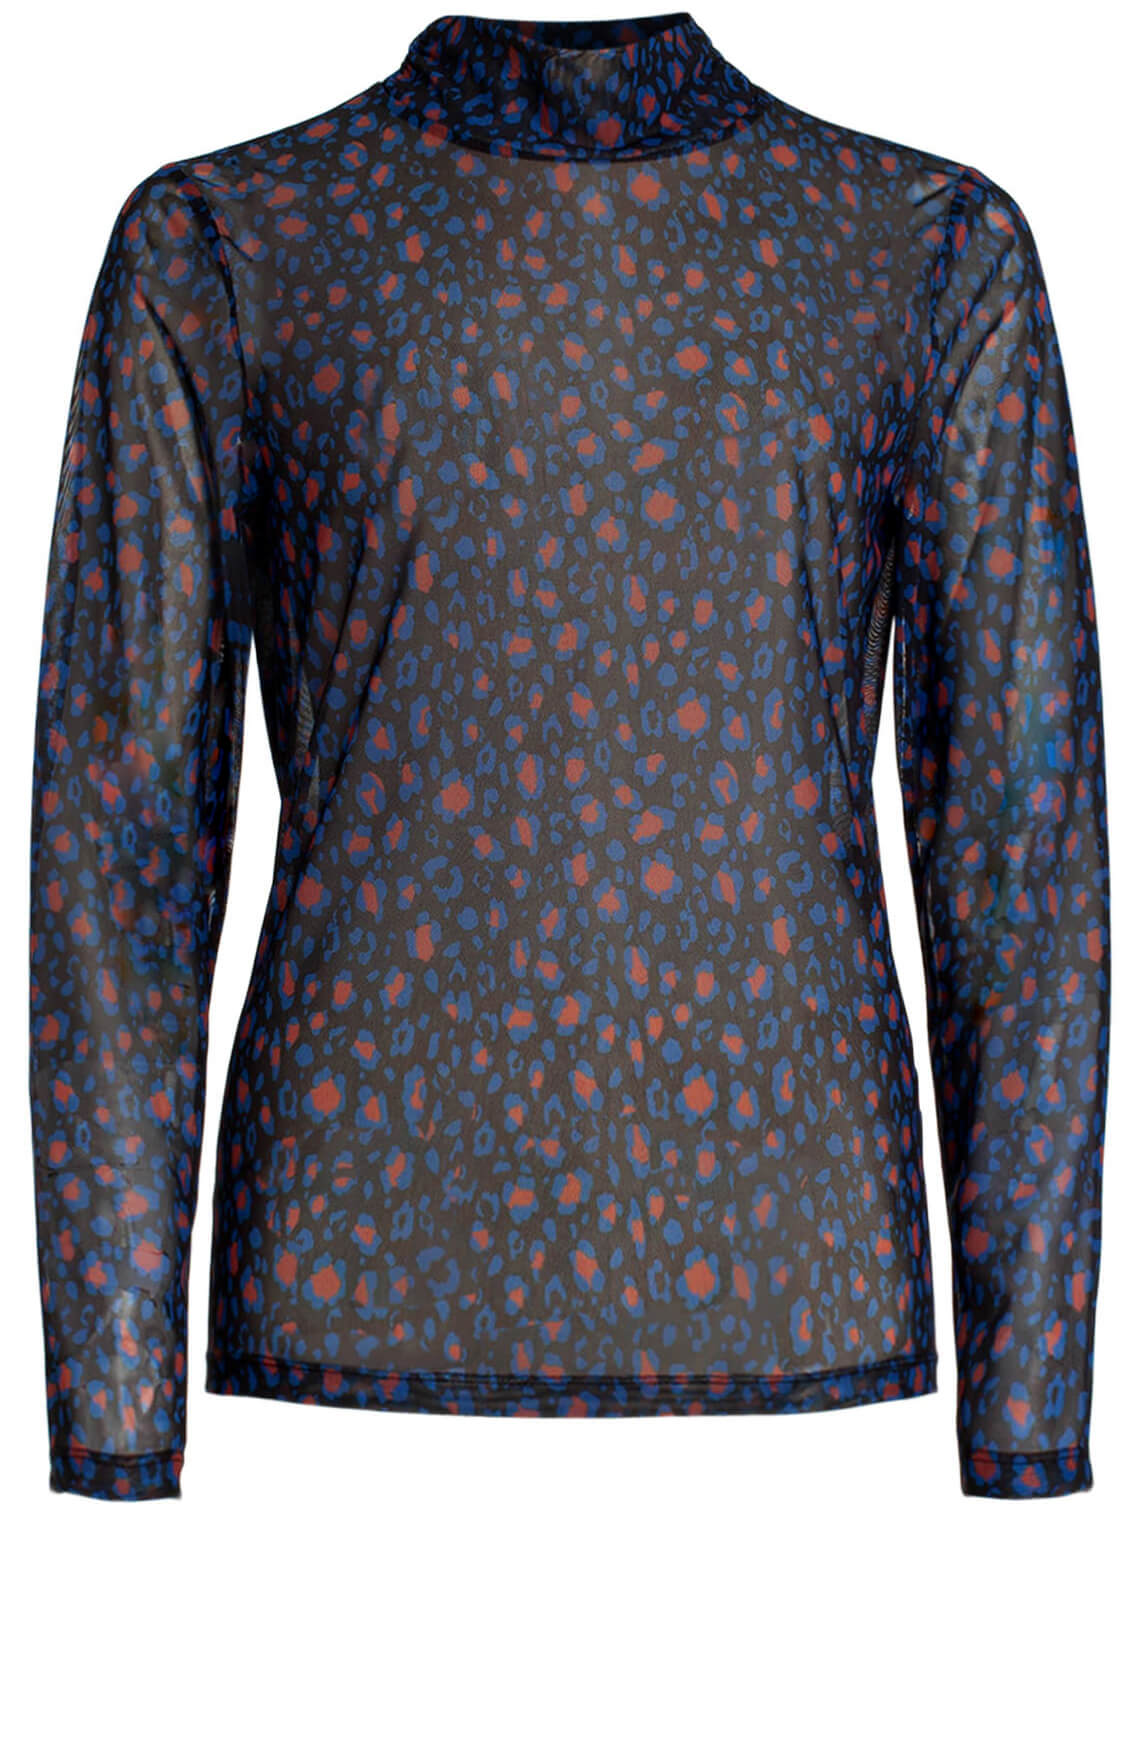 Anna Dames Mesh shirt met panterprint Blauw